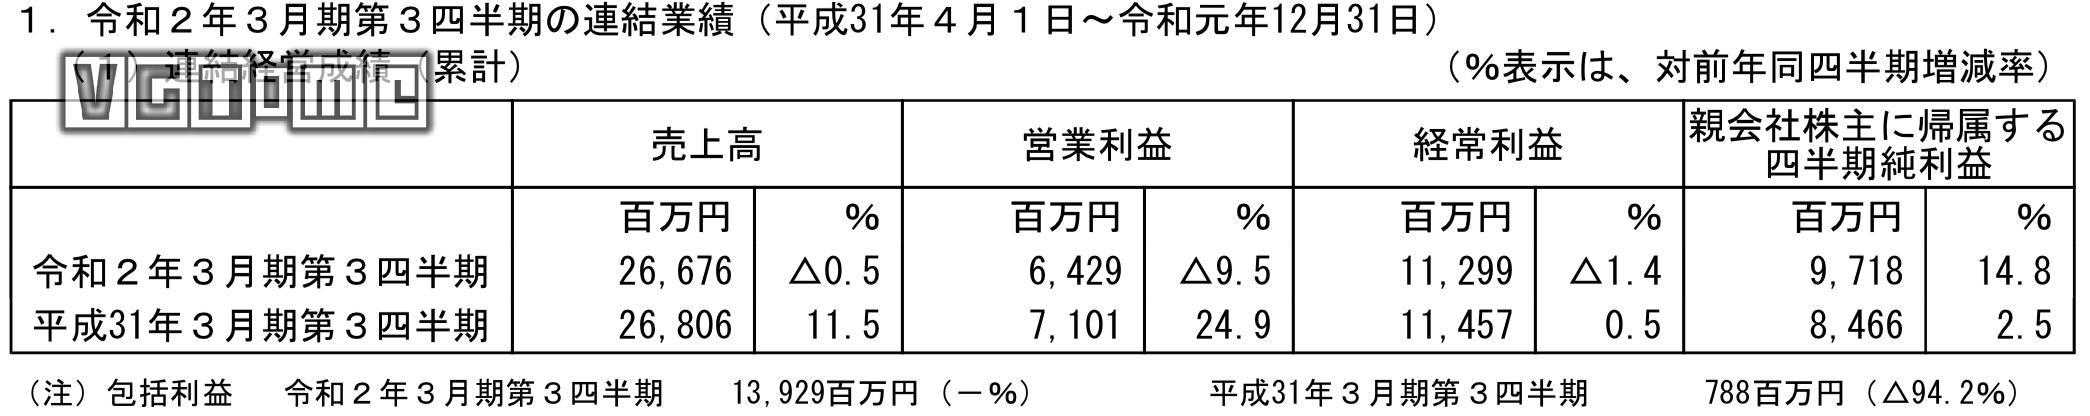 Glorious tekumo Q3 financial report in fy2020: sales volume of lesha's Alchemy workshop exceeded 350000